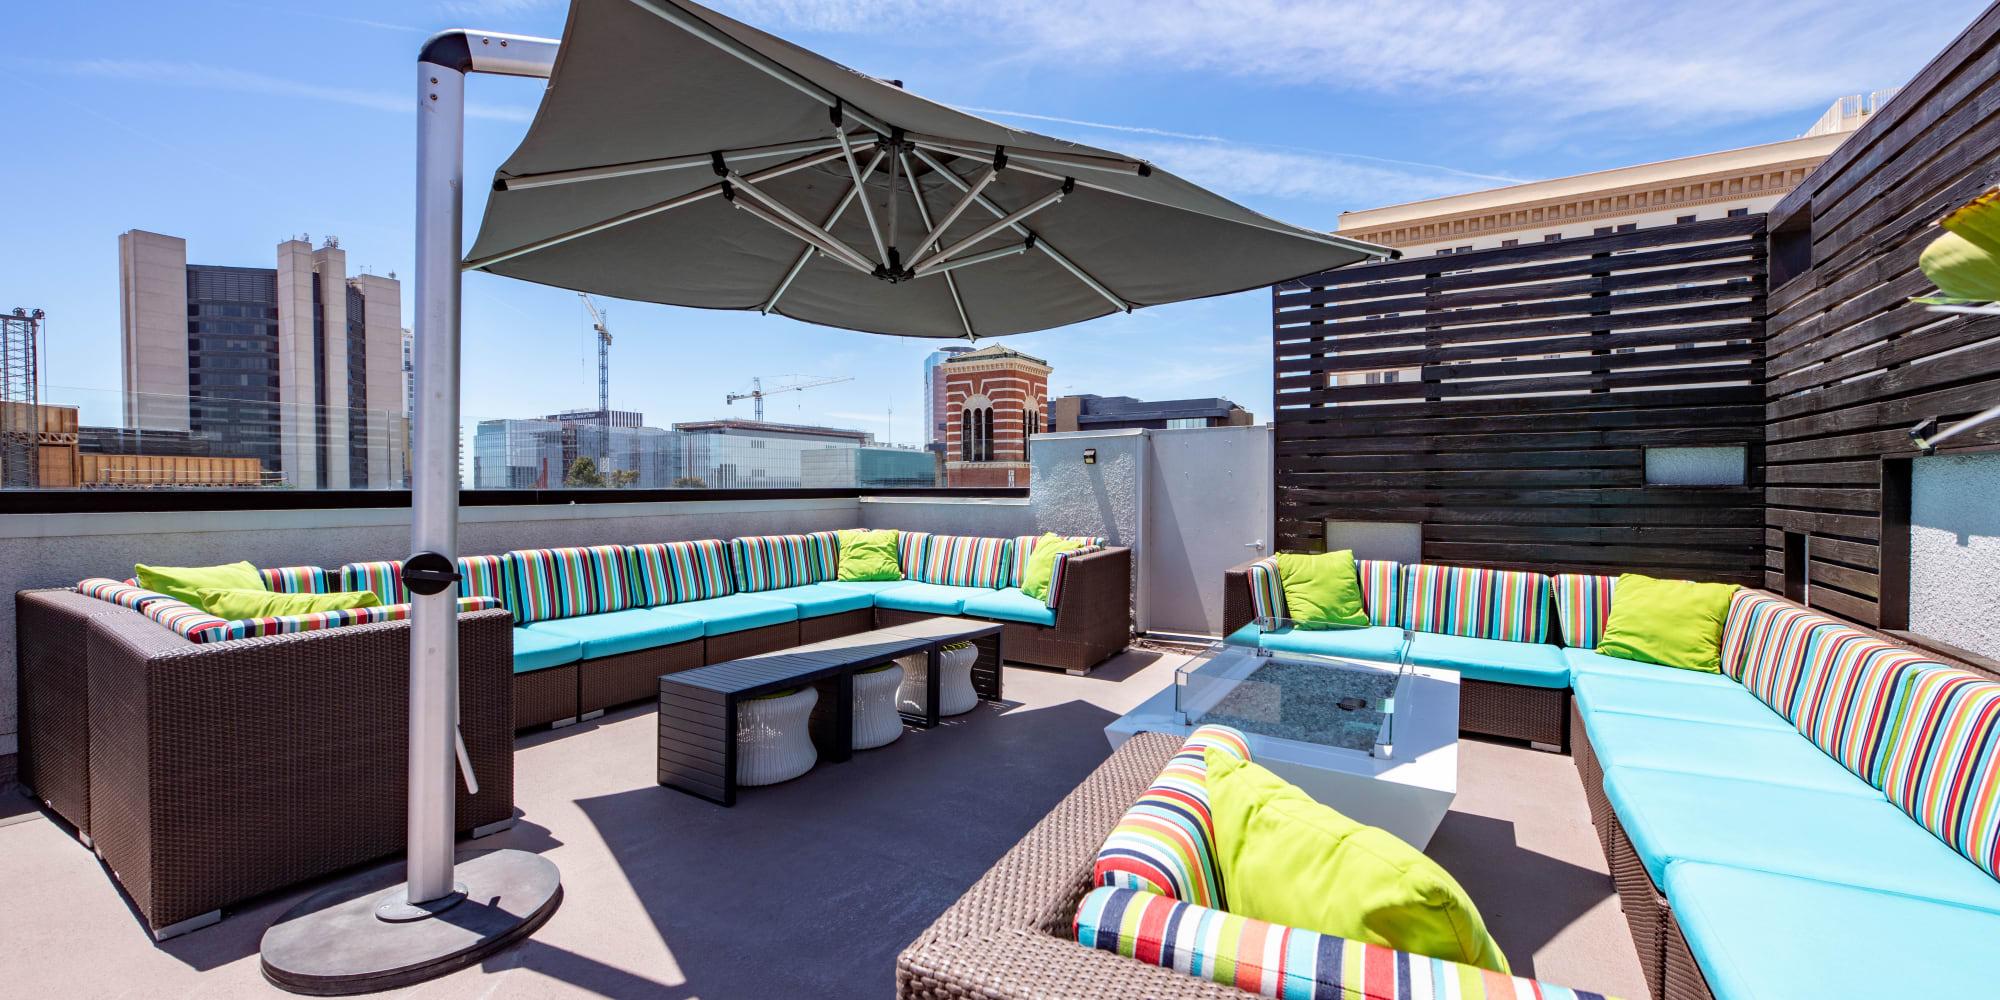 Apartments in Long Beach, California, at Sofi at 3rd